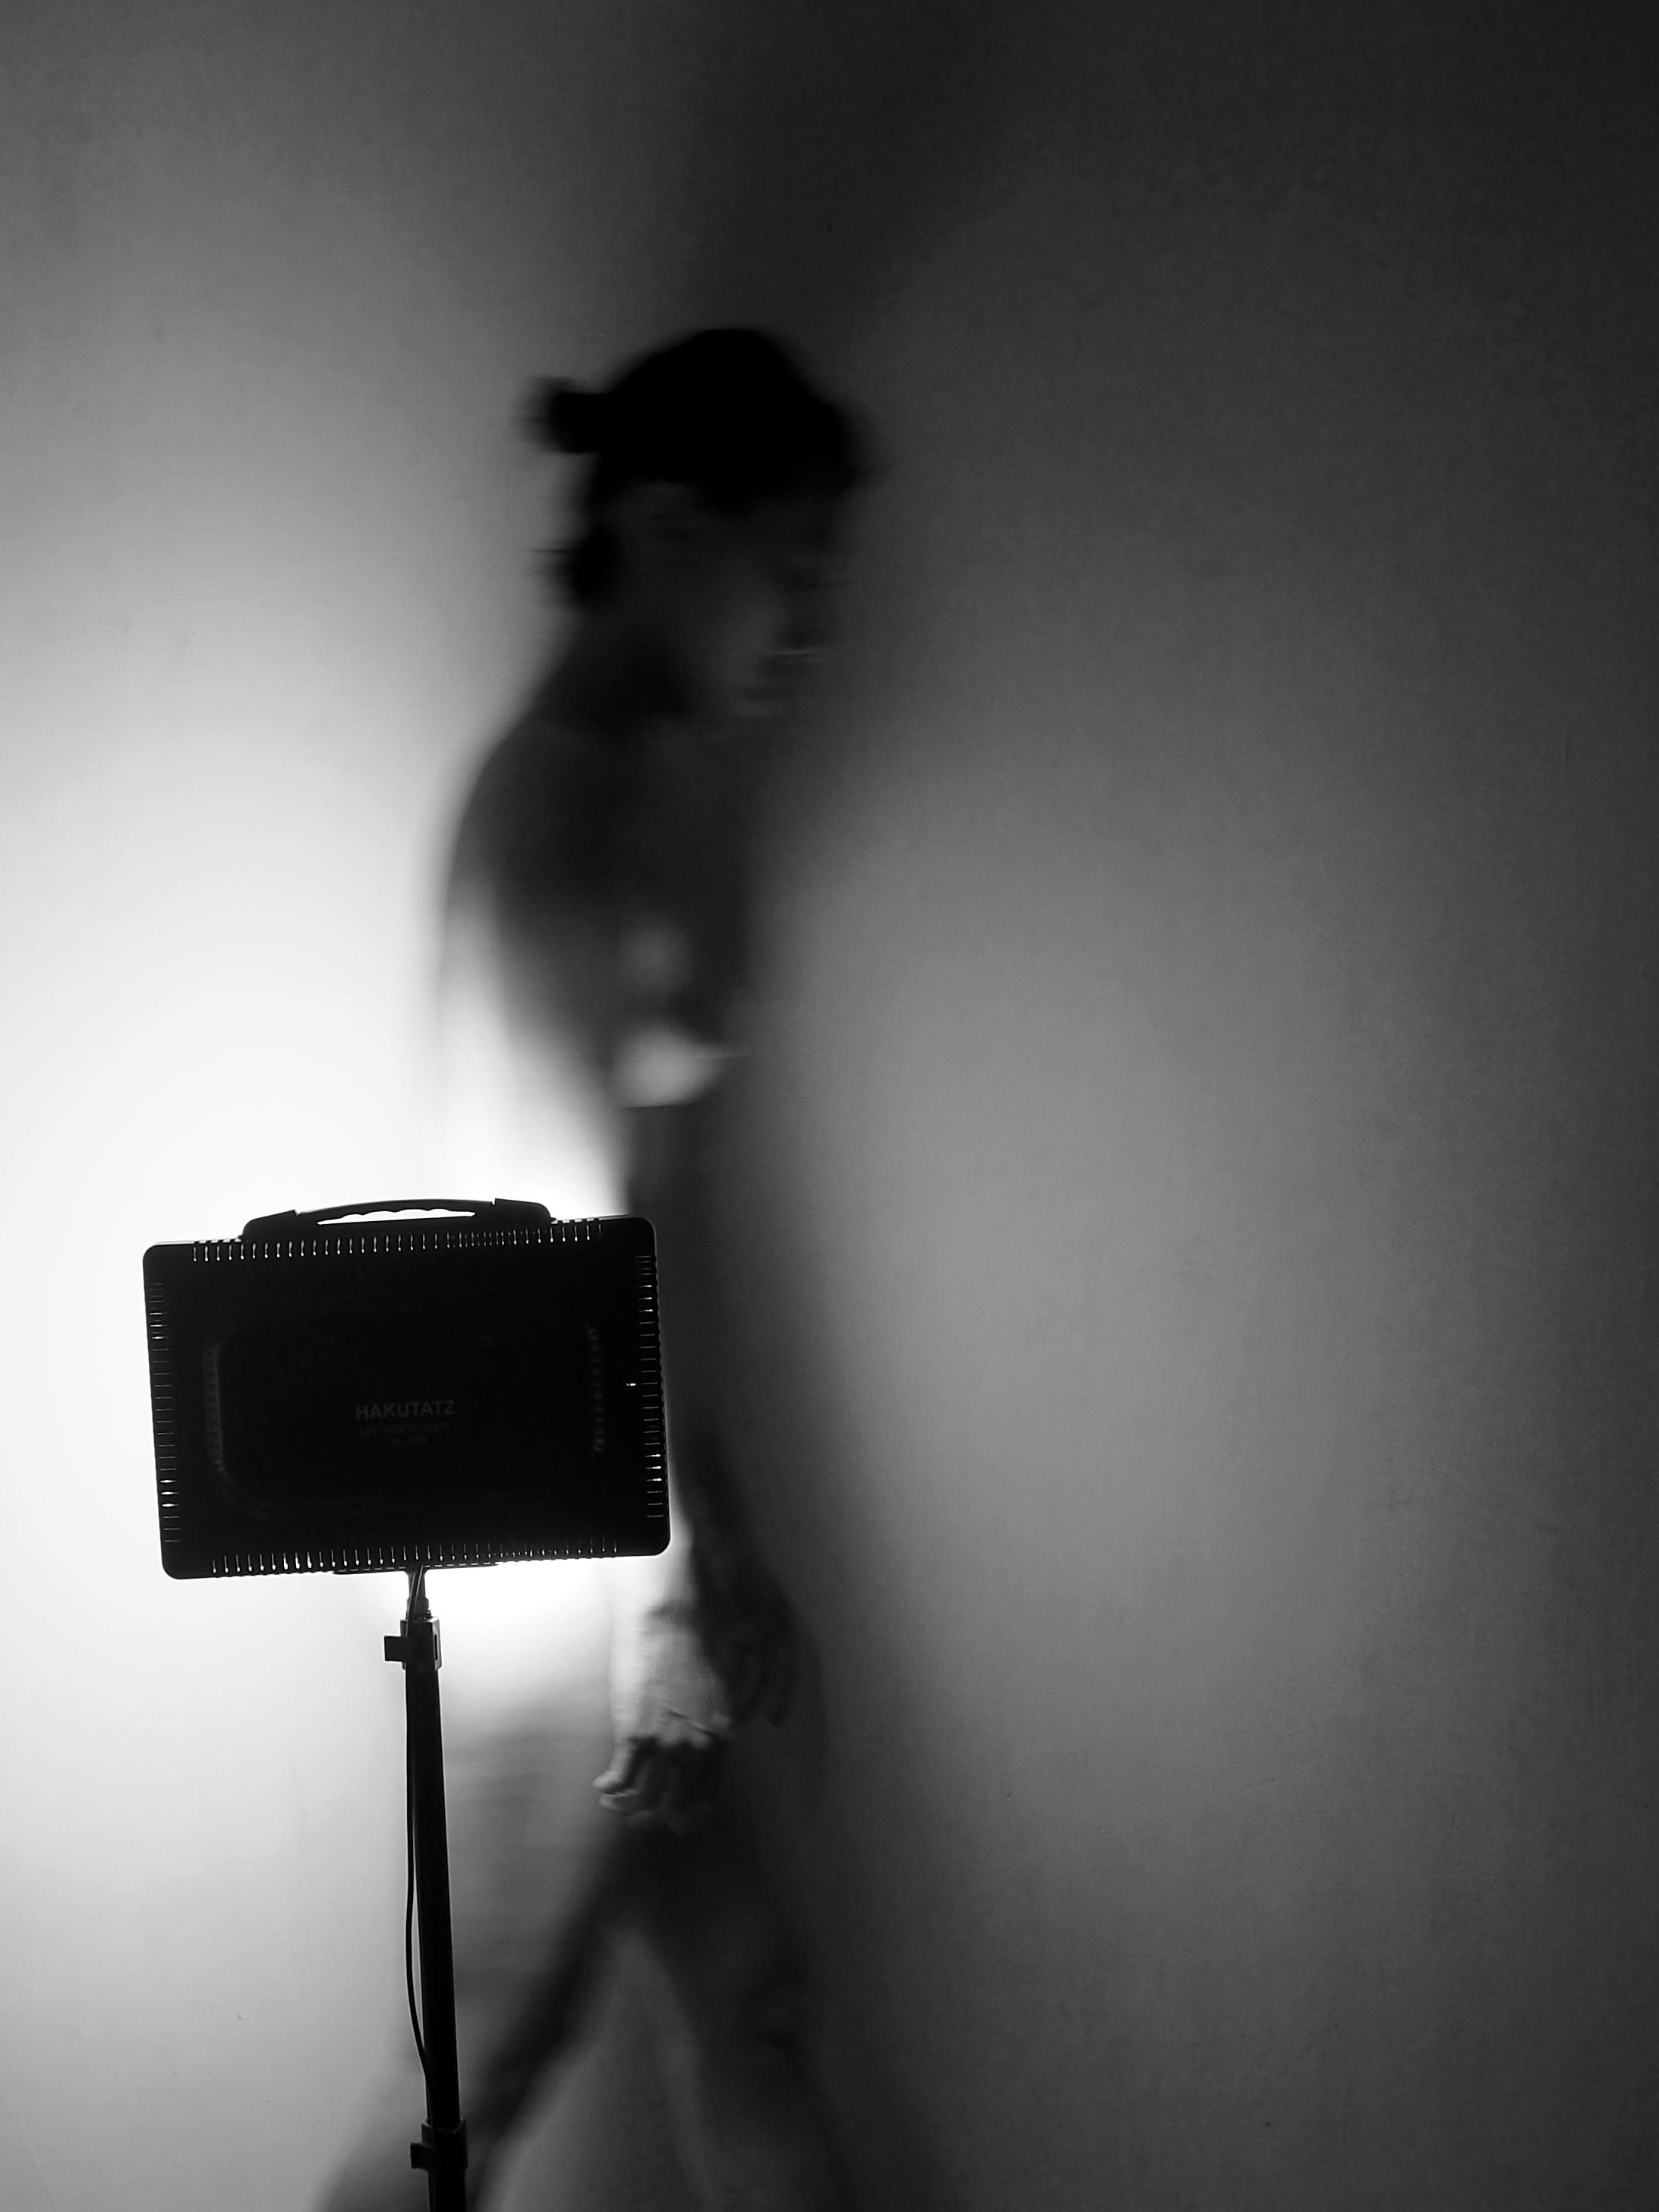 2019 / Sleepwalk / 25x33 cm / Photo by Suelynee 何書伶